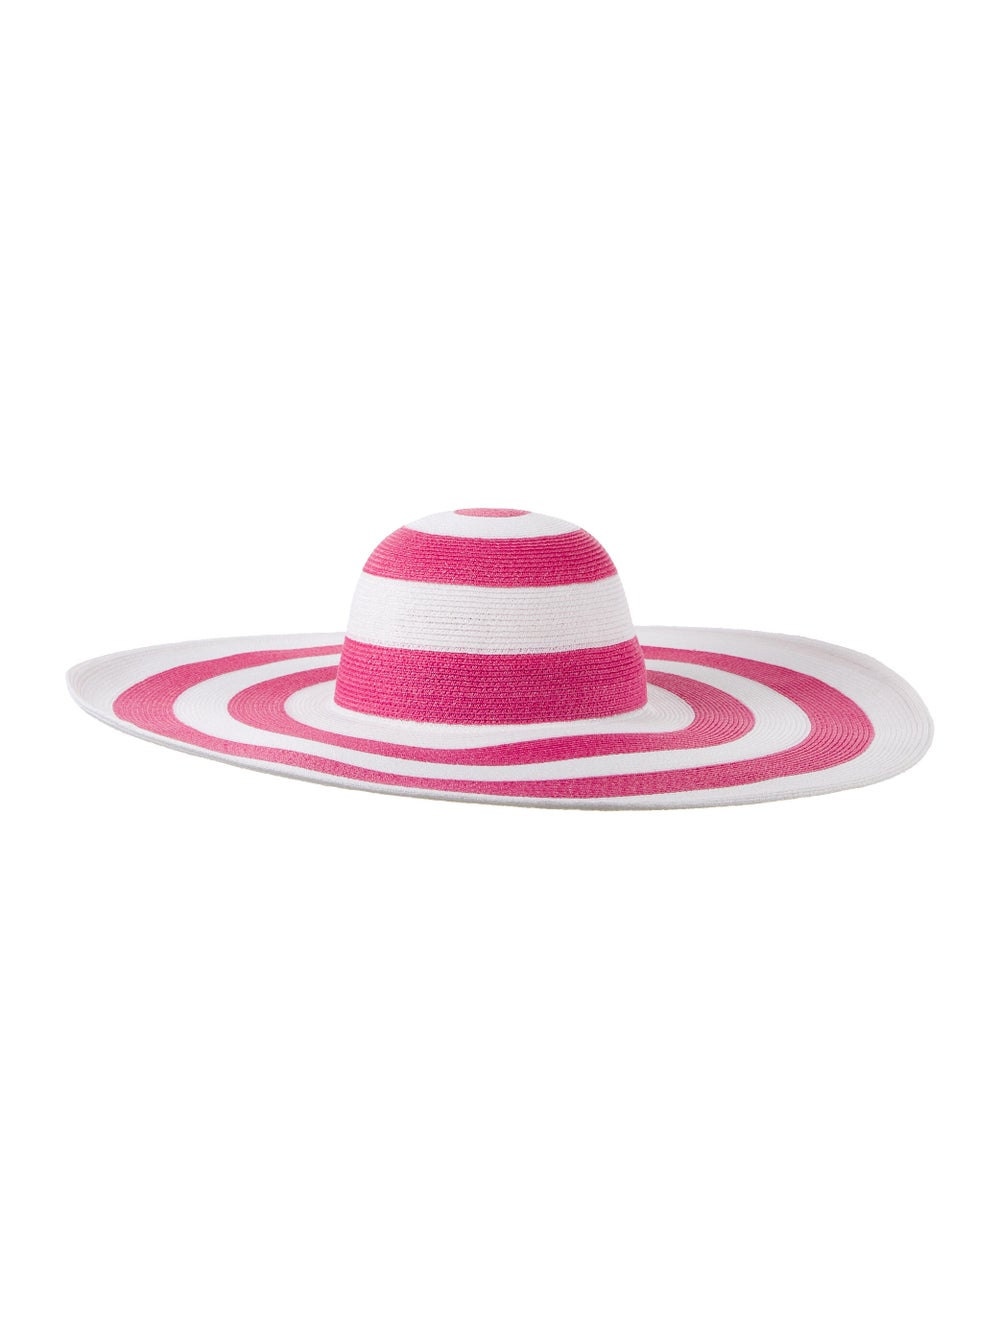 Eugenia Kim Straw Wide-Brim Hat Pink - image 1